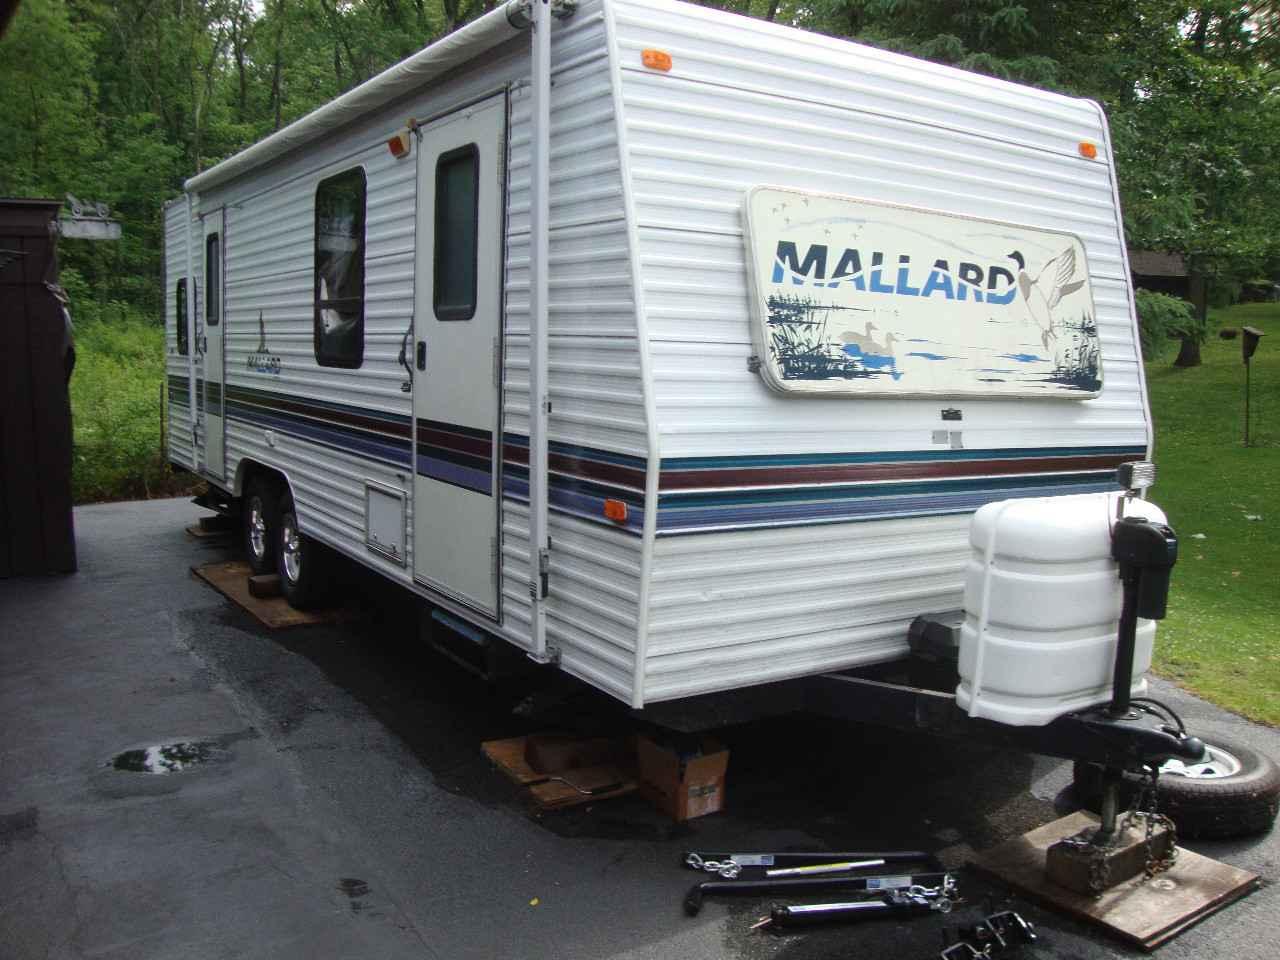 1998 Used Fleetwood Mallard 27 Travel Trailer In Illinois Il